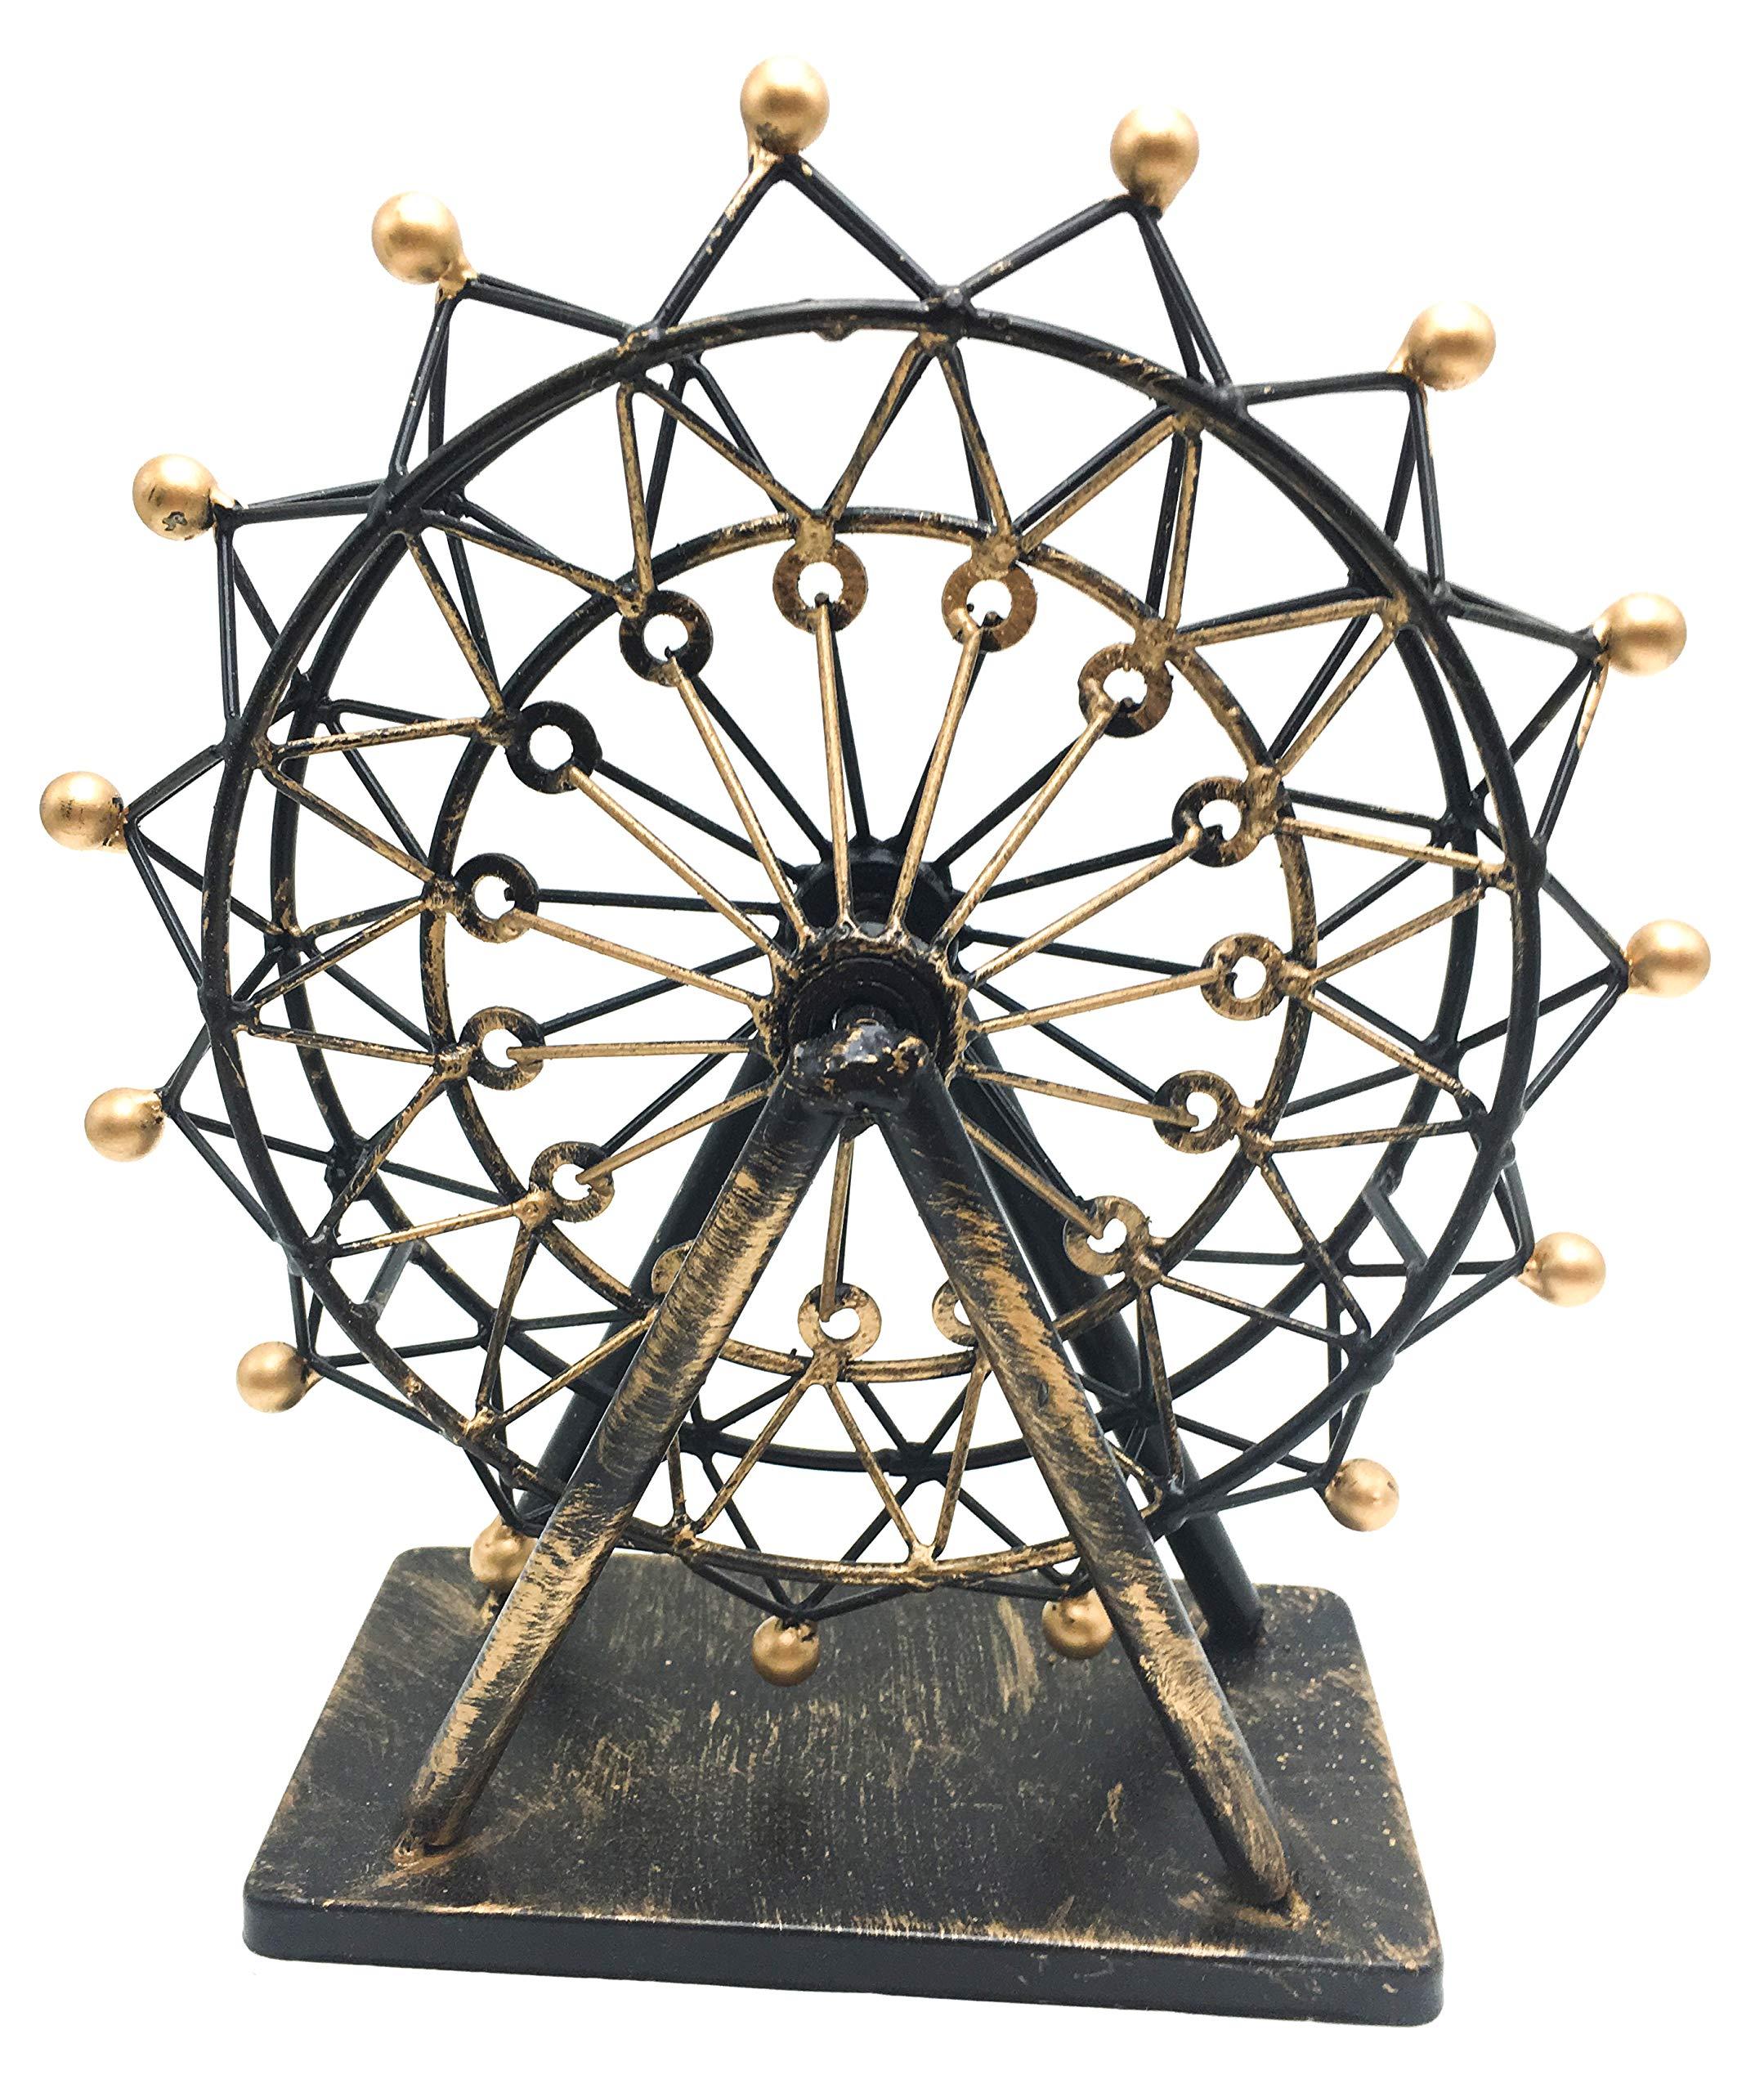 ZeeMoe Regular Sized Rotating Ferris Wheel Figurine Statue Vintage Craftsmanship, Fireplace, Tabletop, Office, Yard, Home Decoration